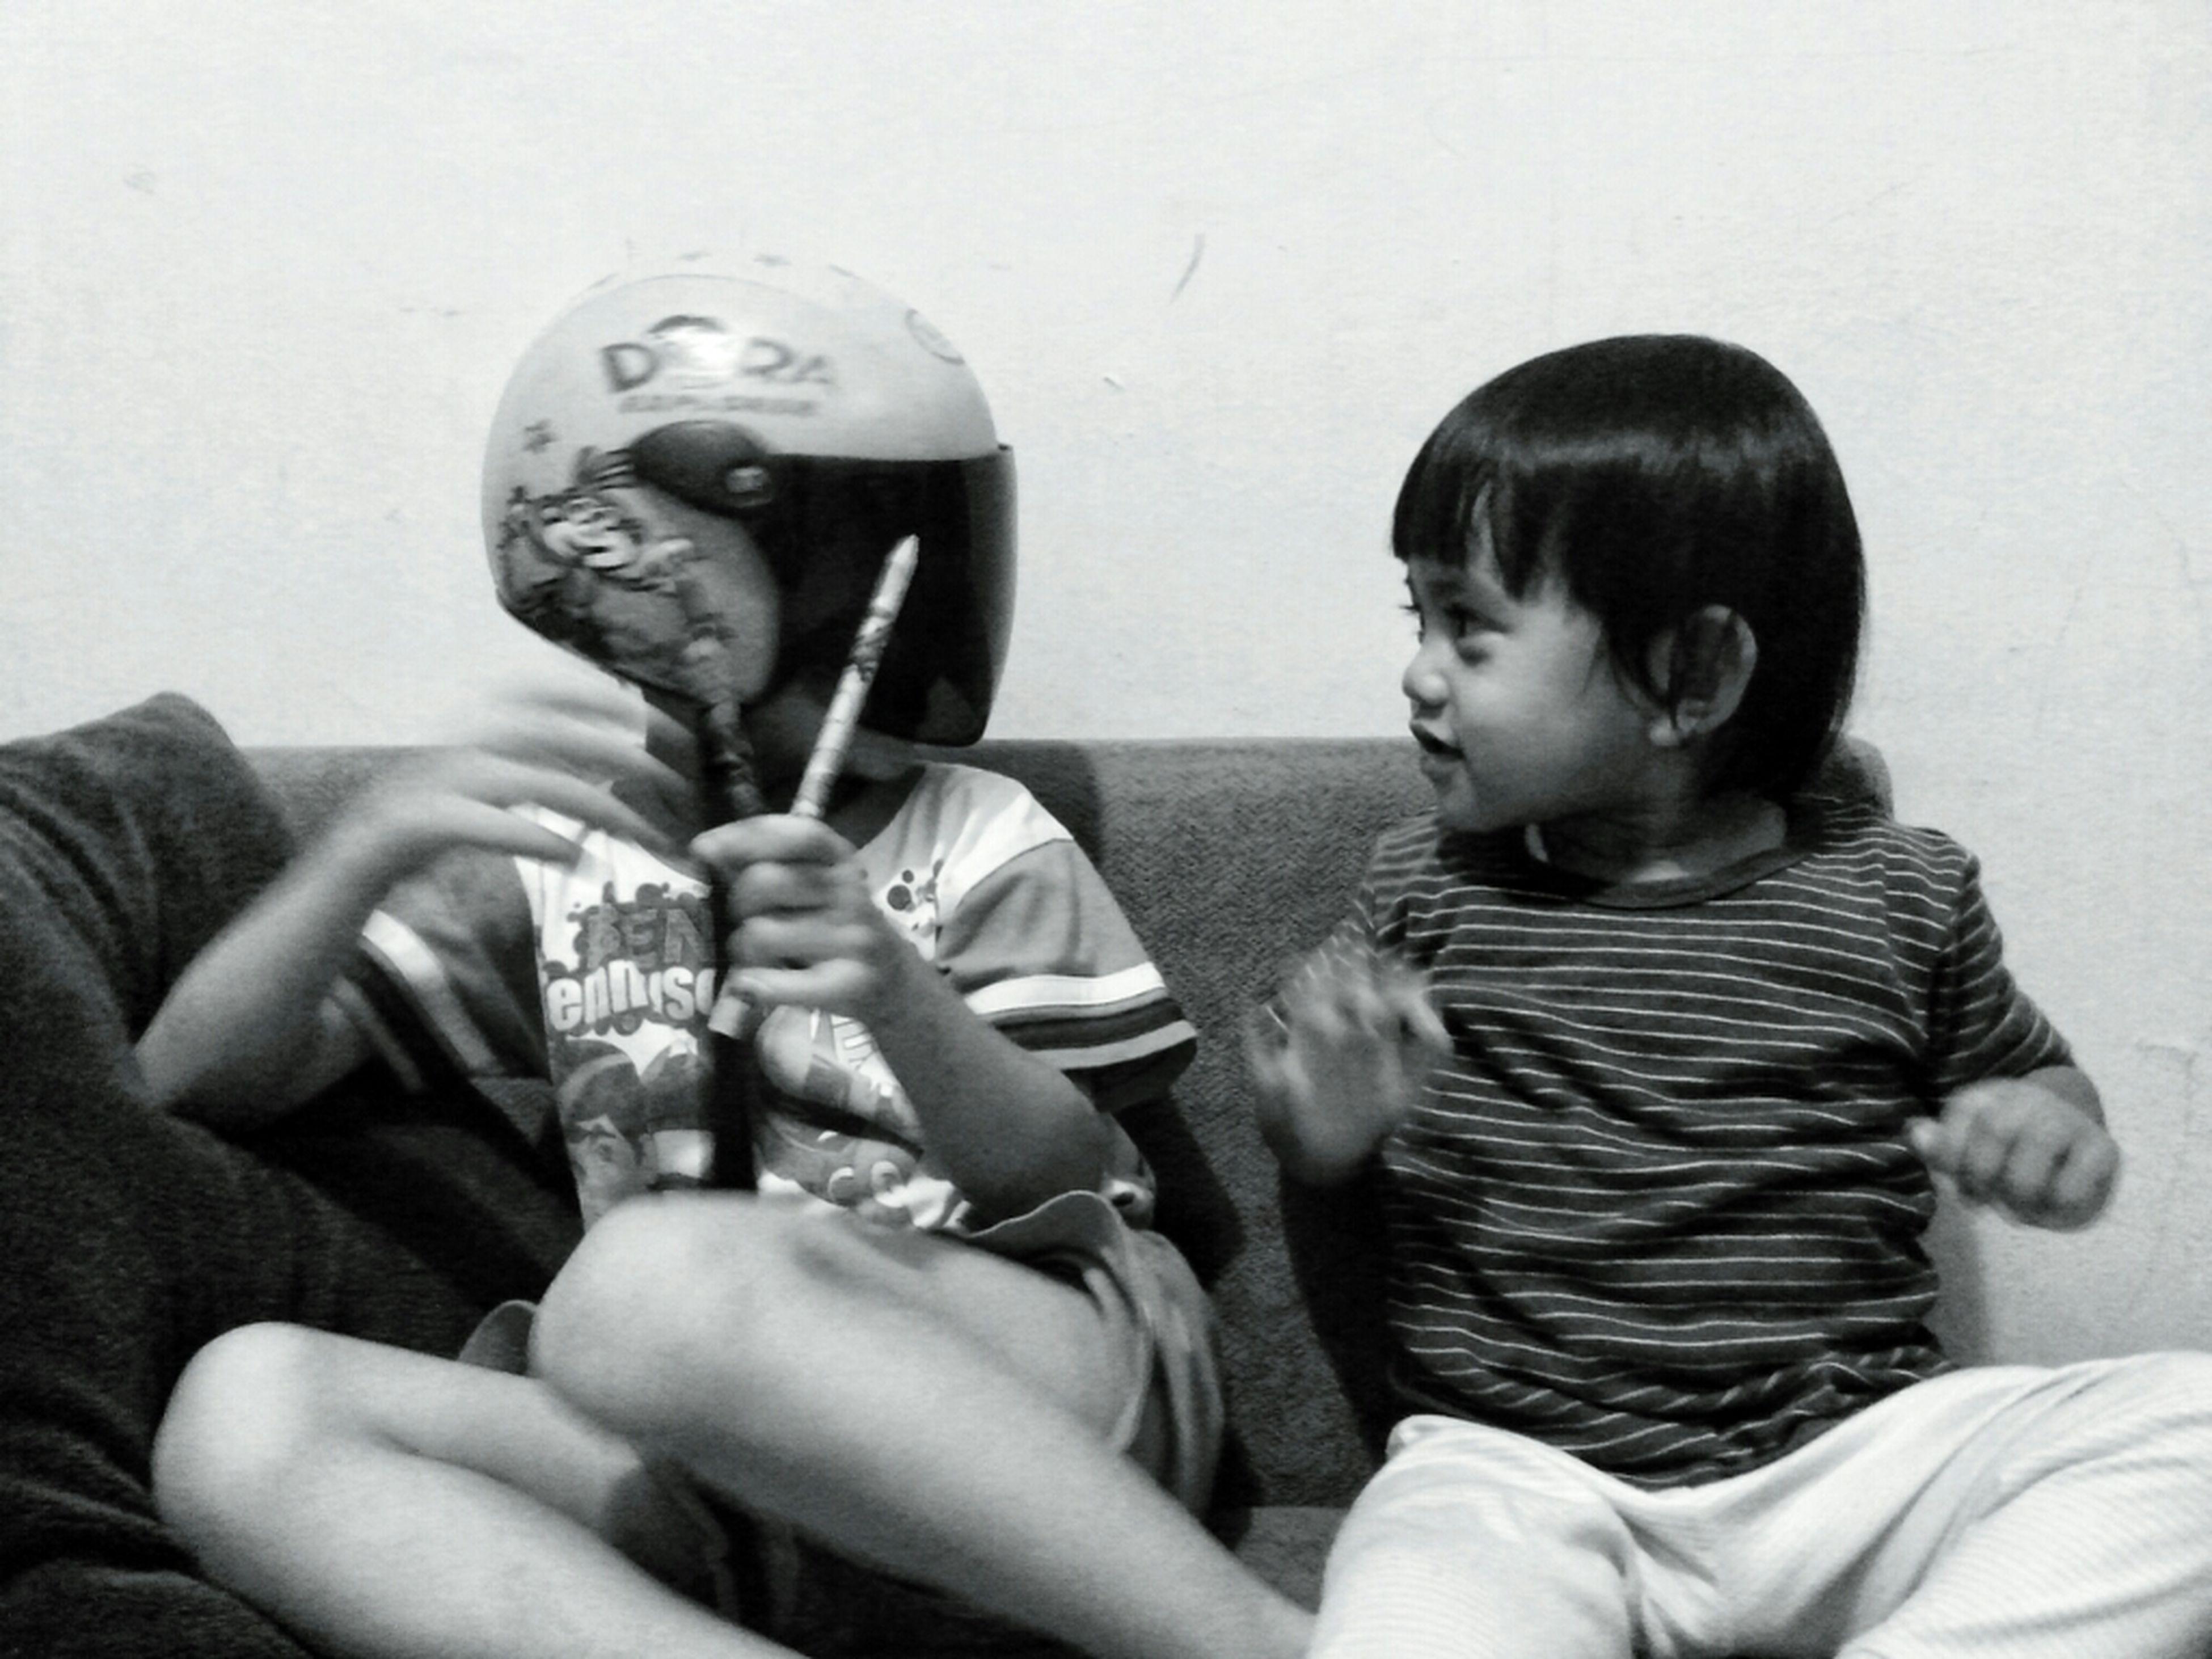 Kids Fun Blackandwhite Bw Bnw Original Fun